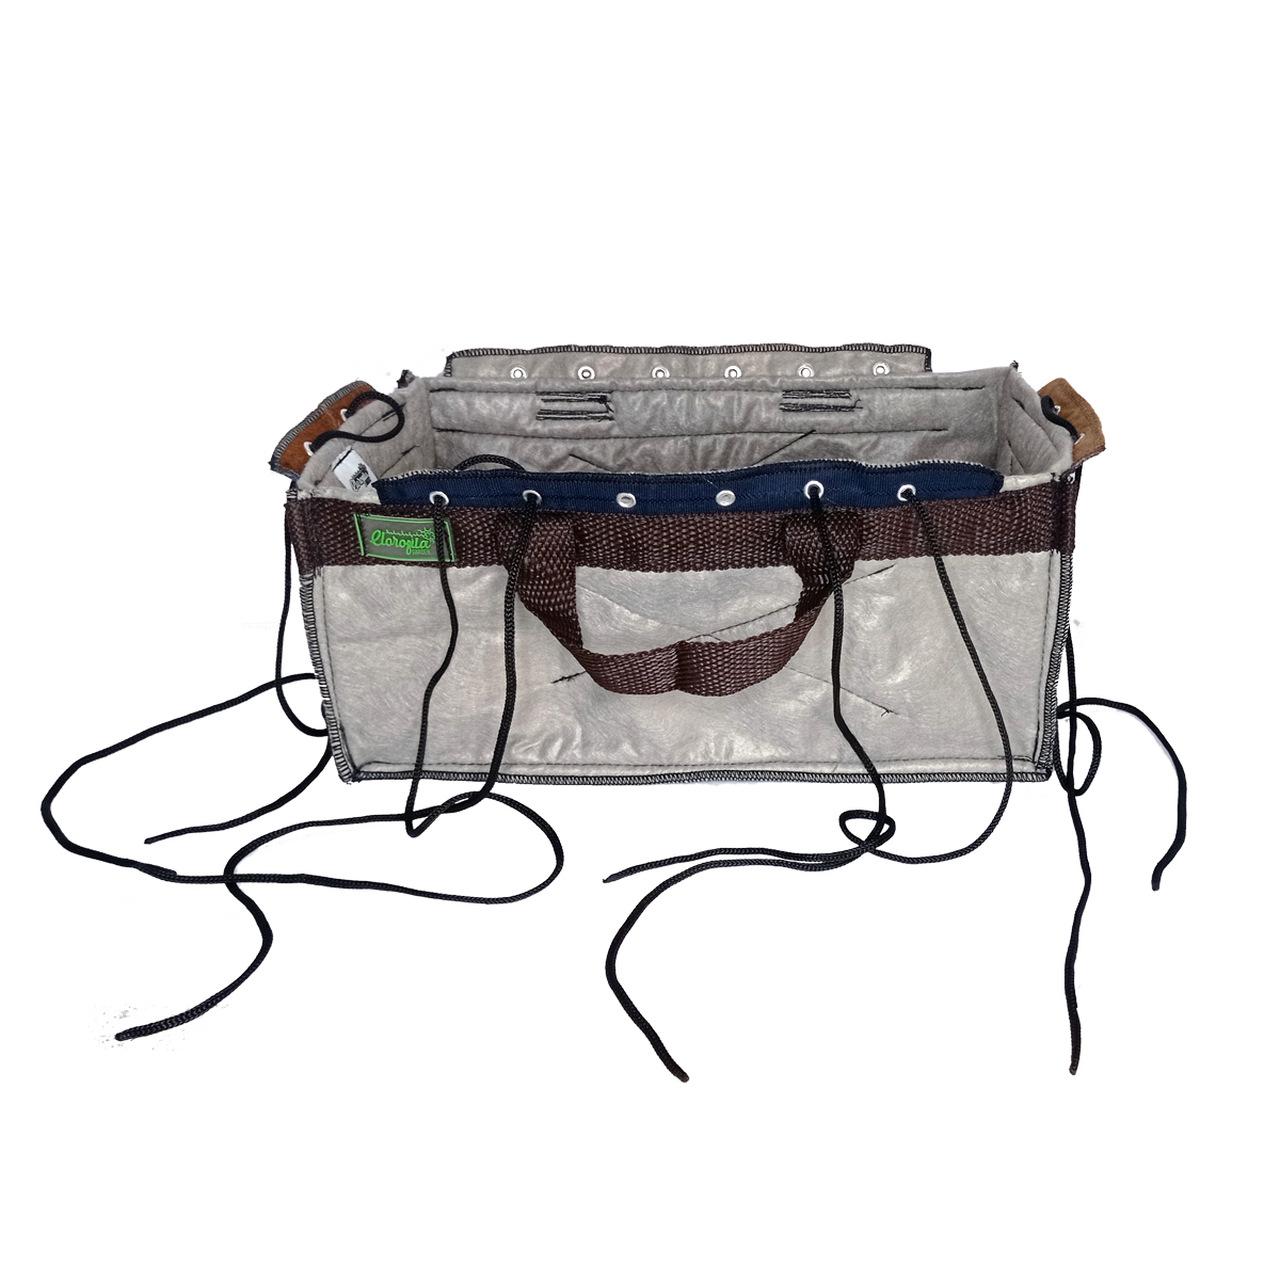 Vaso de Feltro PC Grow de 5 Litros com Alças e Amarras Clorofila Garden